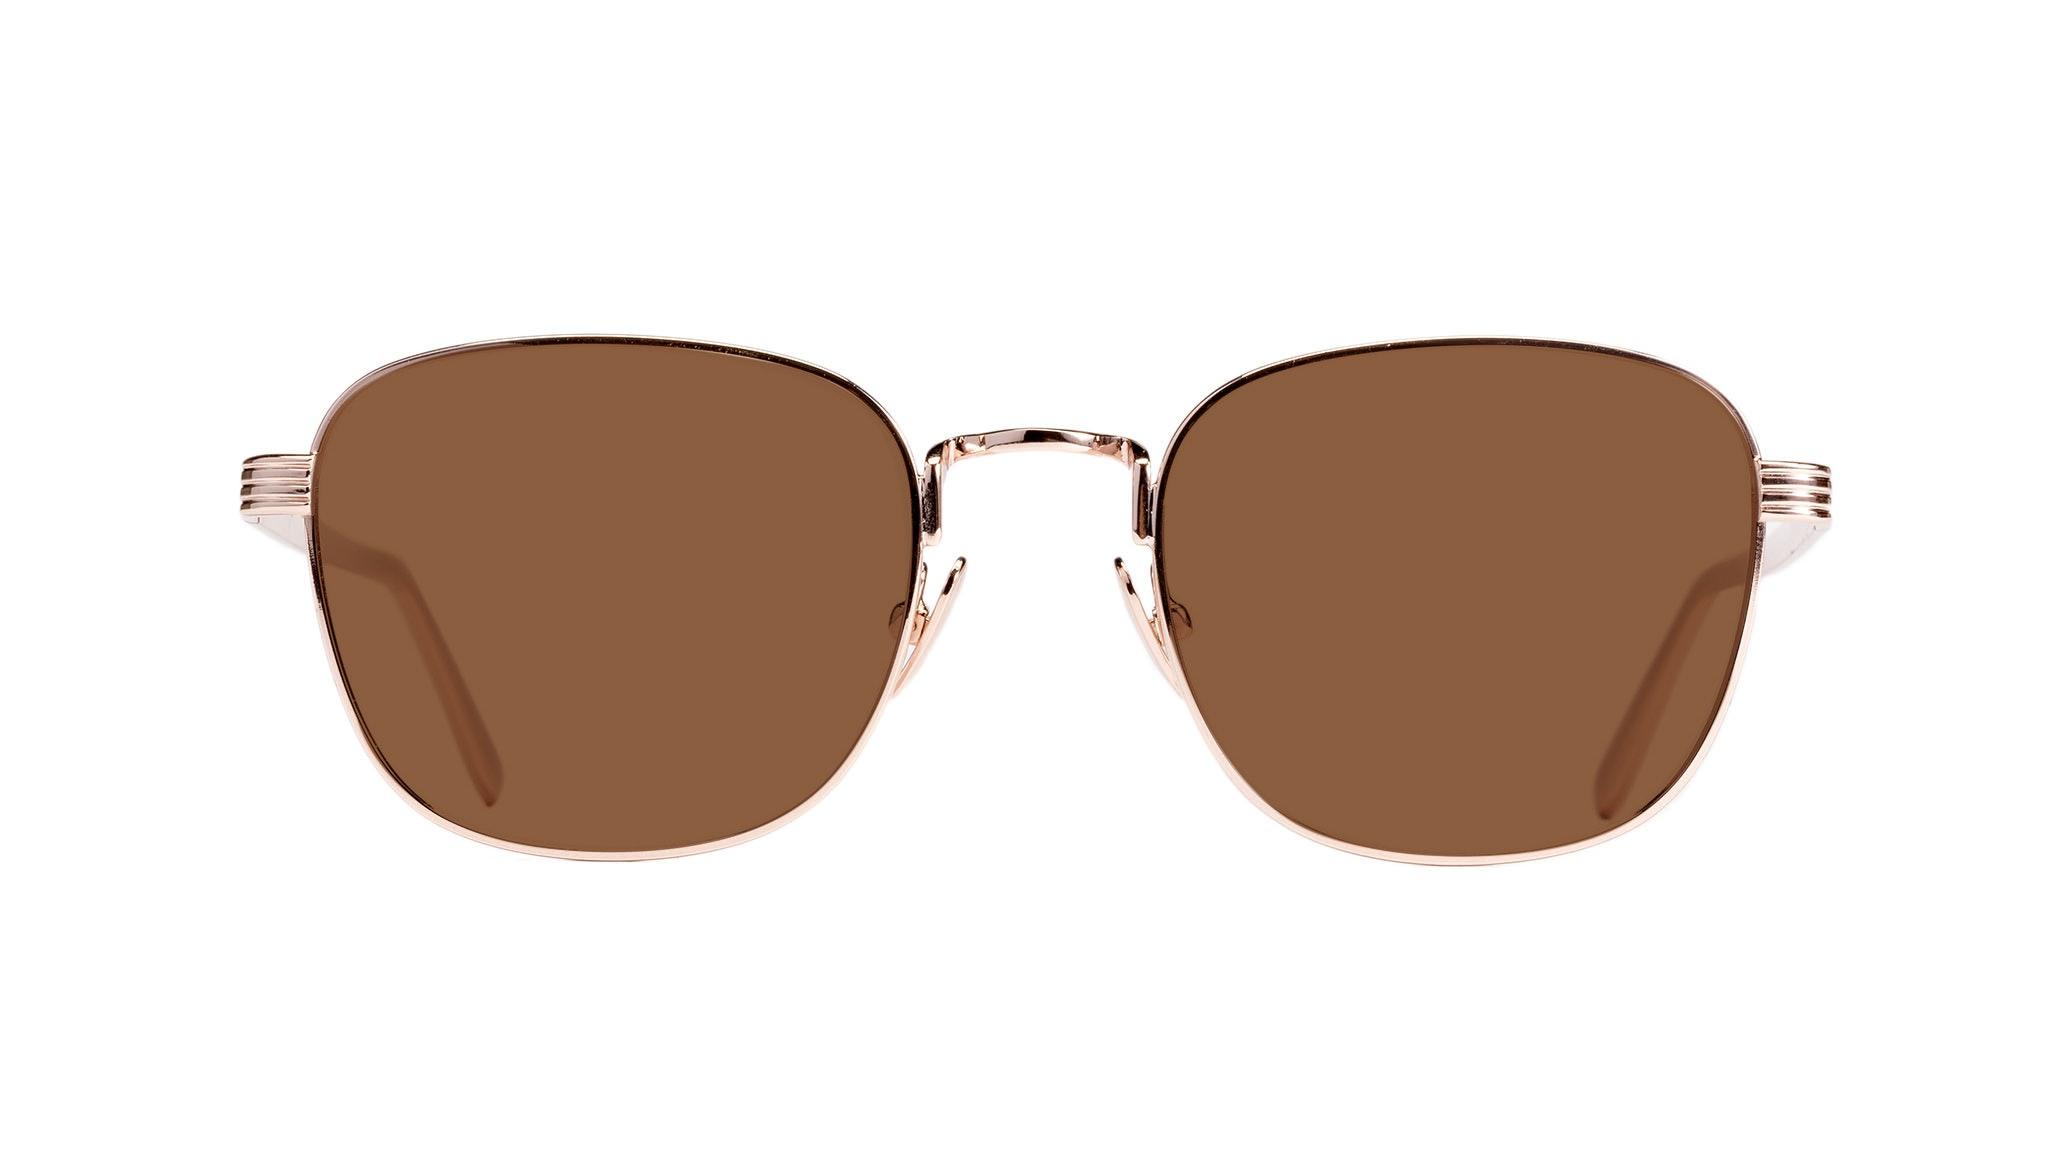 Affordable Fashion Glasses Rectangle Sunglasses Women Delight Gold